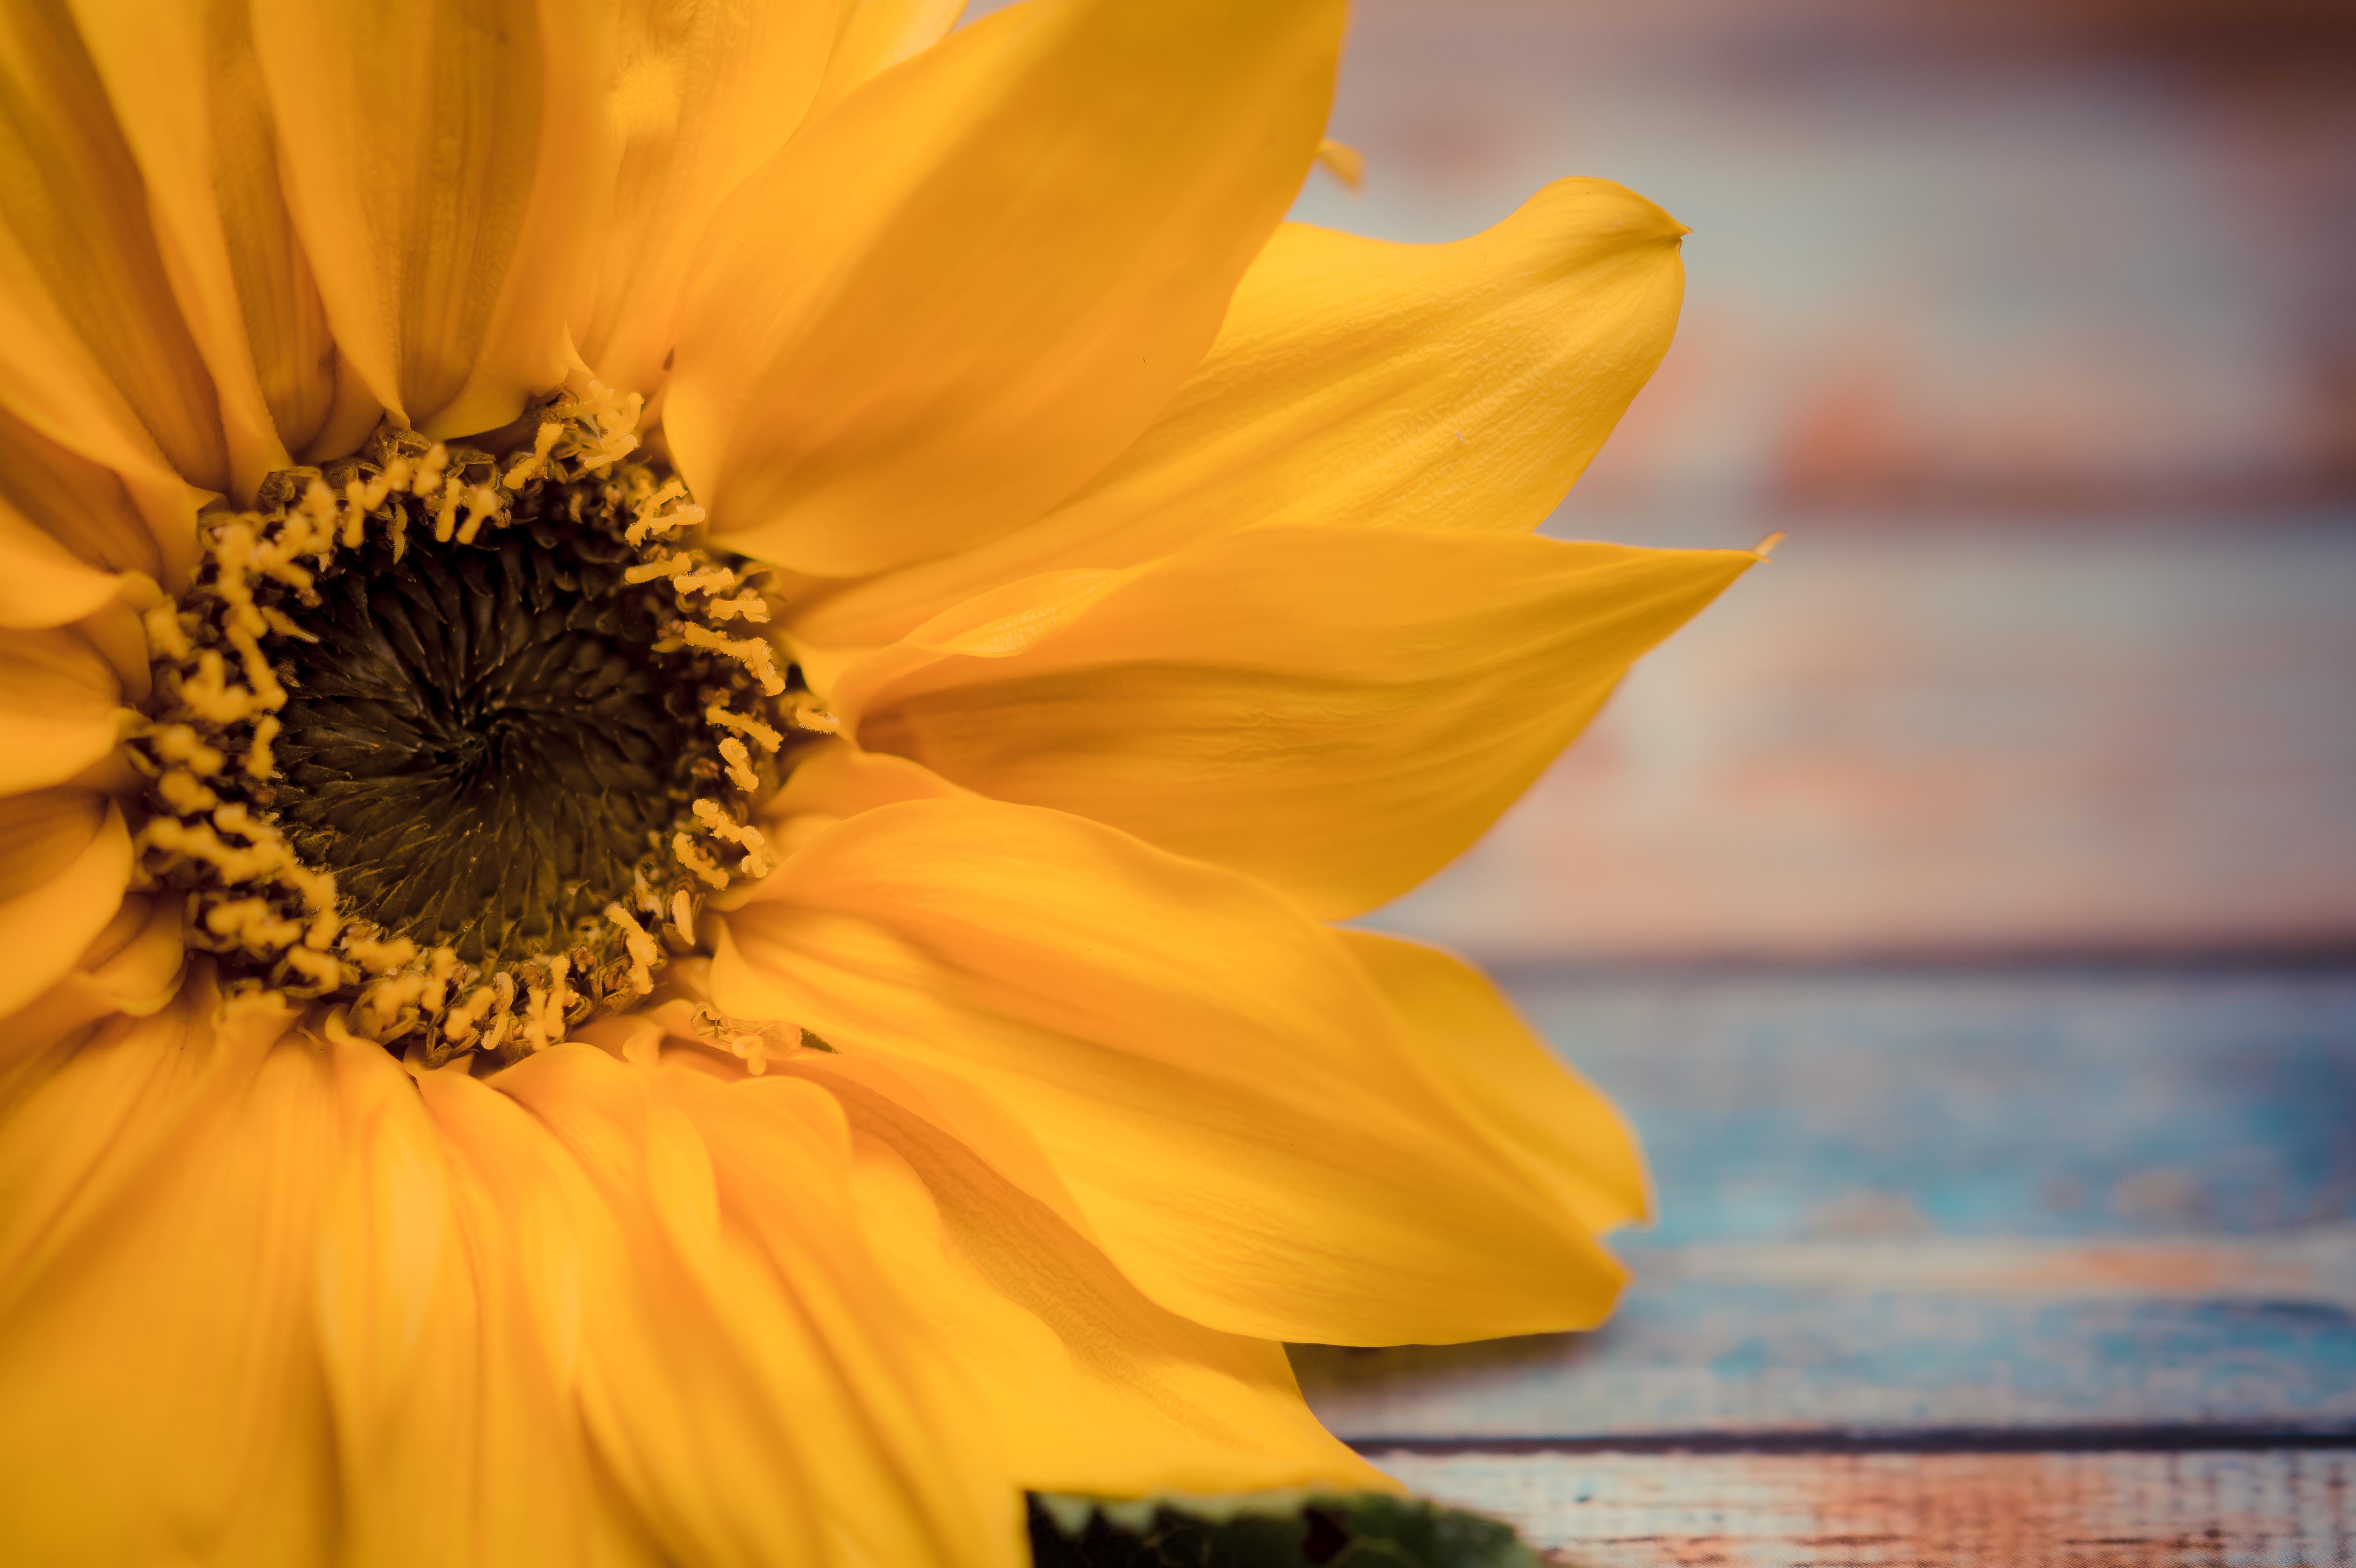 Free images sunflower flower yellow flowers background summer sunflower flower yellow flowers background summer flora petal close up macro photography plant pollen spring sunlight mightylinksfo